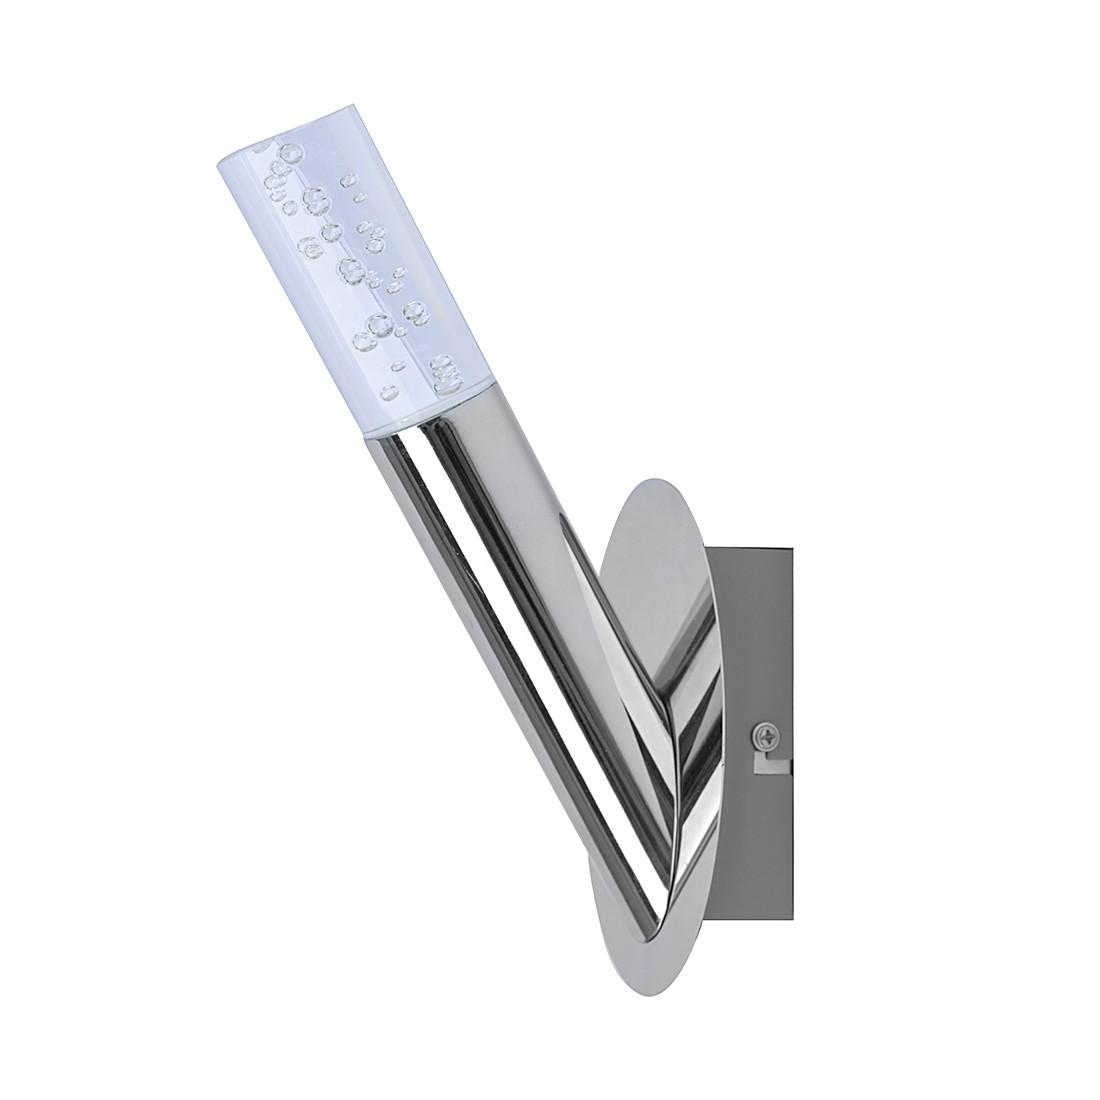 Wandleuchte MIDU ● Metall/Kunststoff ● 1-flammig- Lux A+